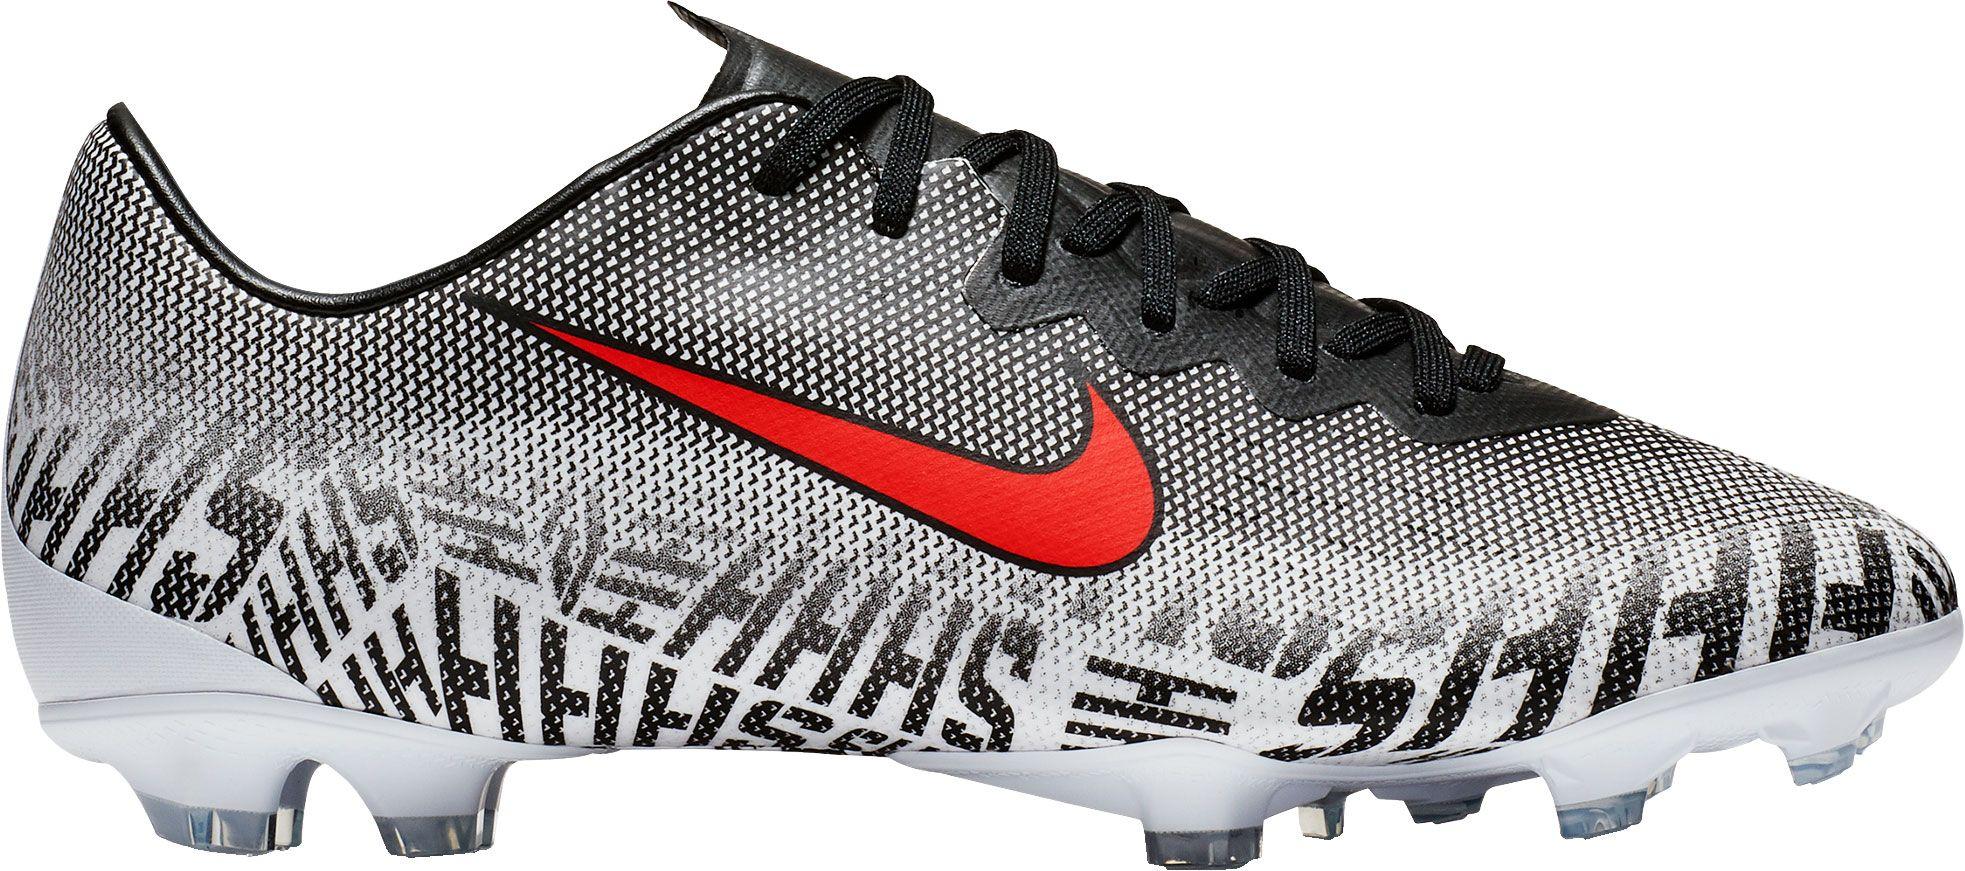 Nike Kids' Mercurial Neymar Vapor 12 Elite FG Soccer Cleats, Boy's, Size: 5.0, White